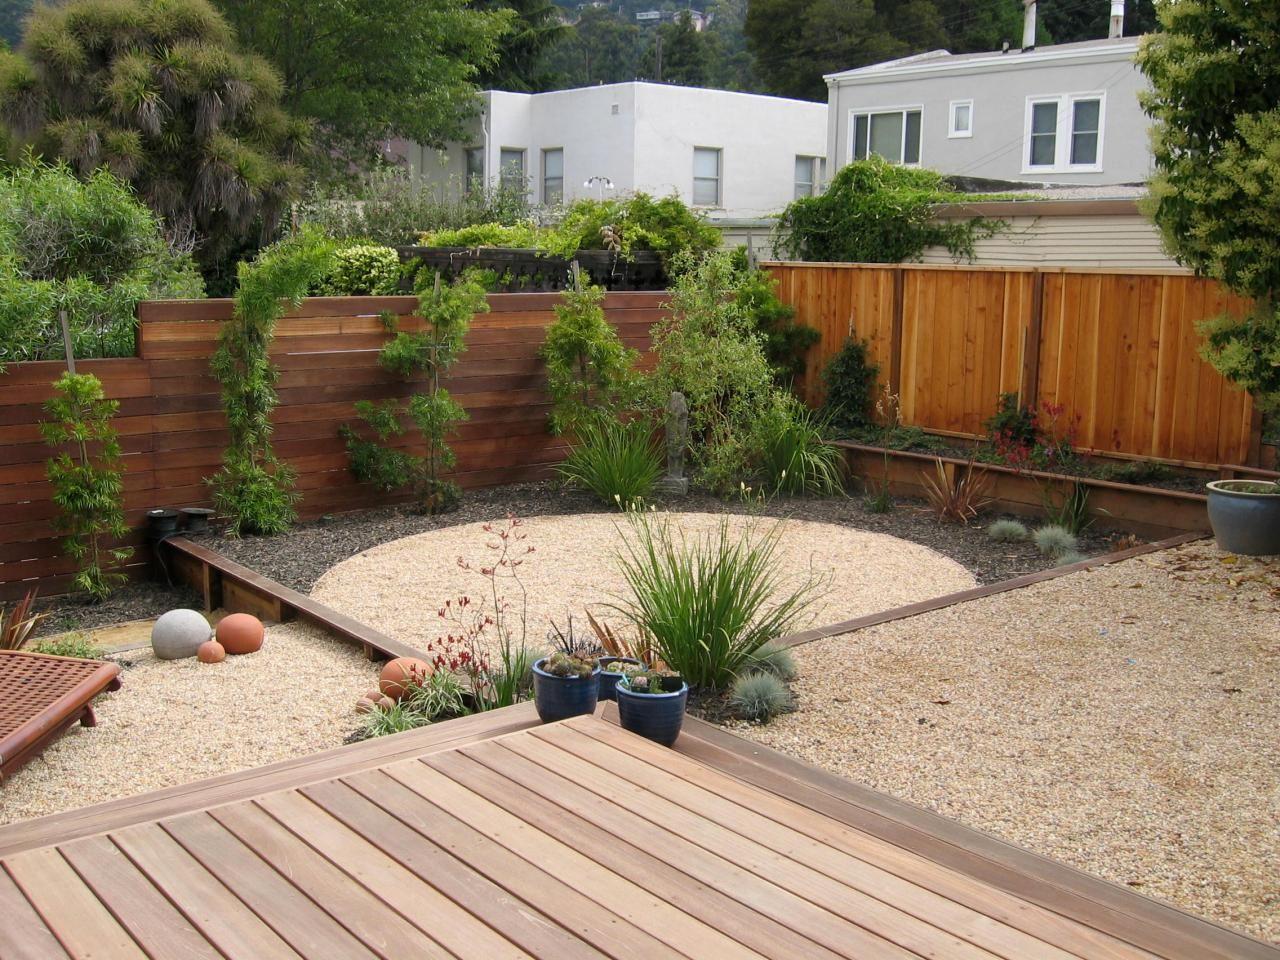 Patio Materials And Surfaces Garten Terrasse Hintergarten Patio Garten